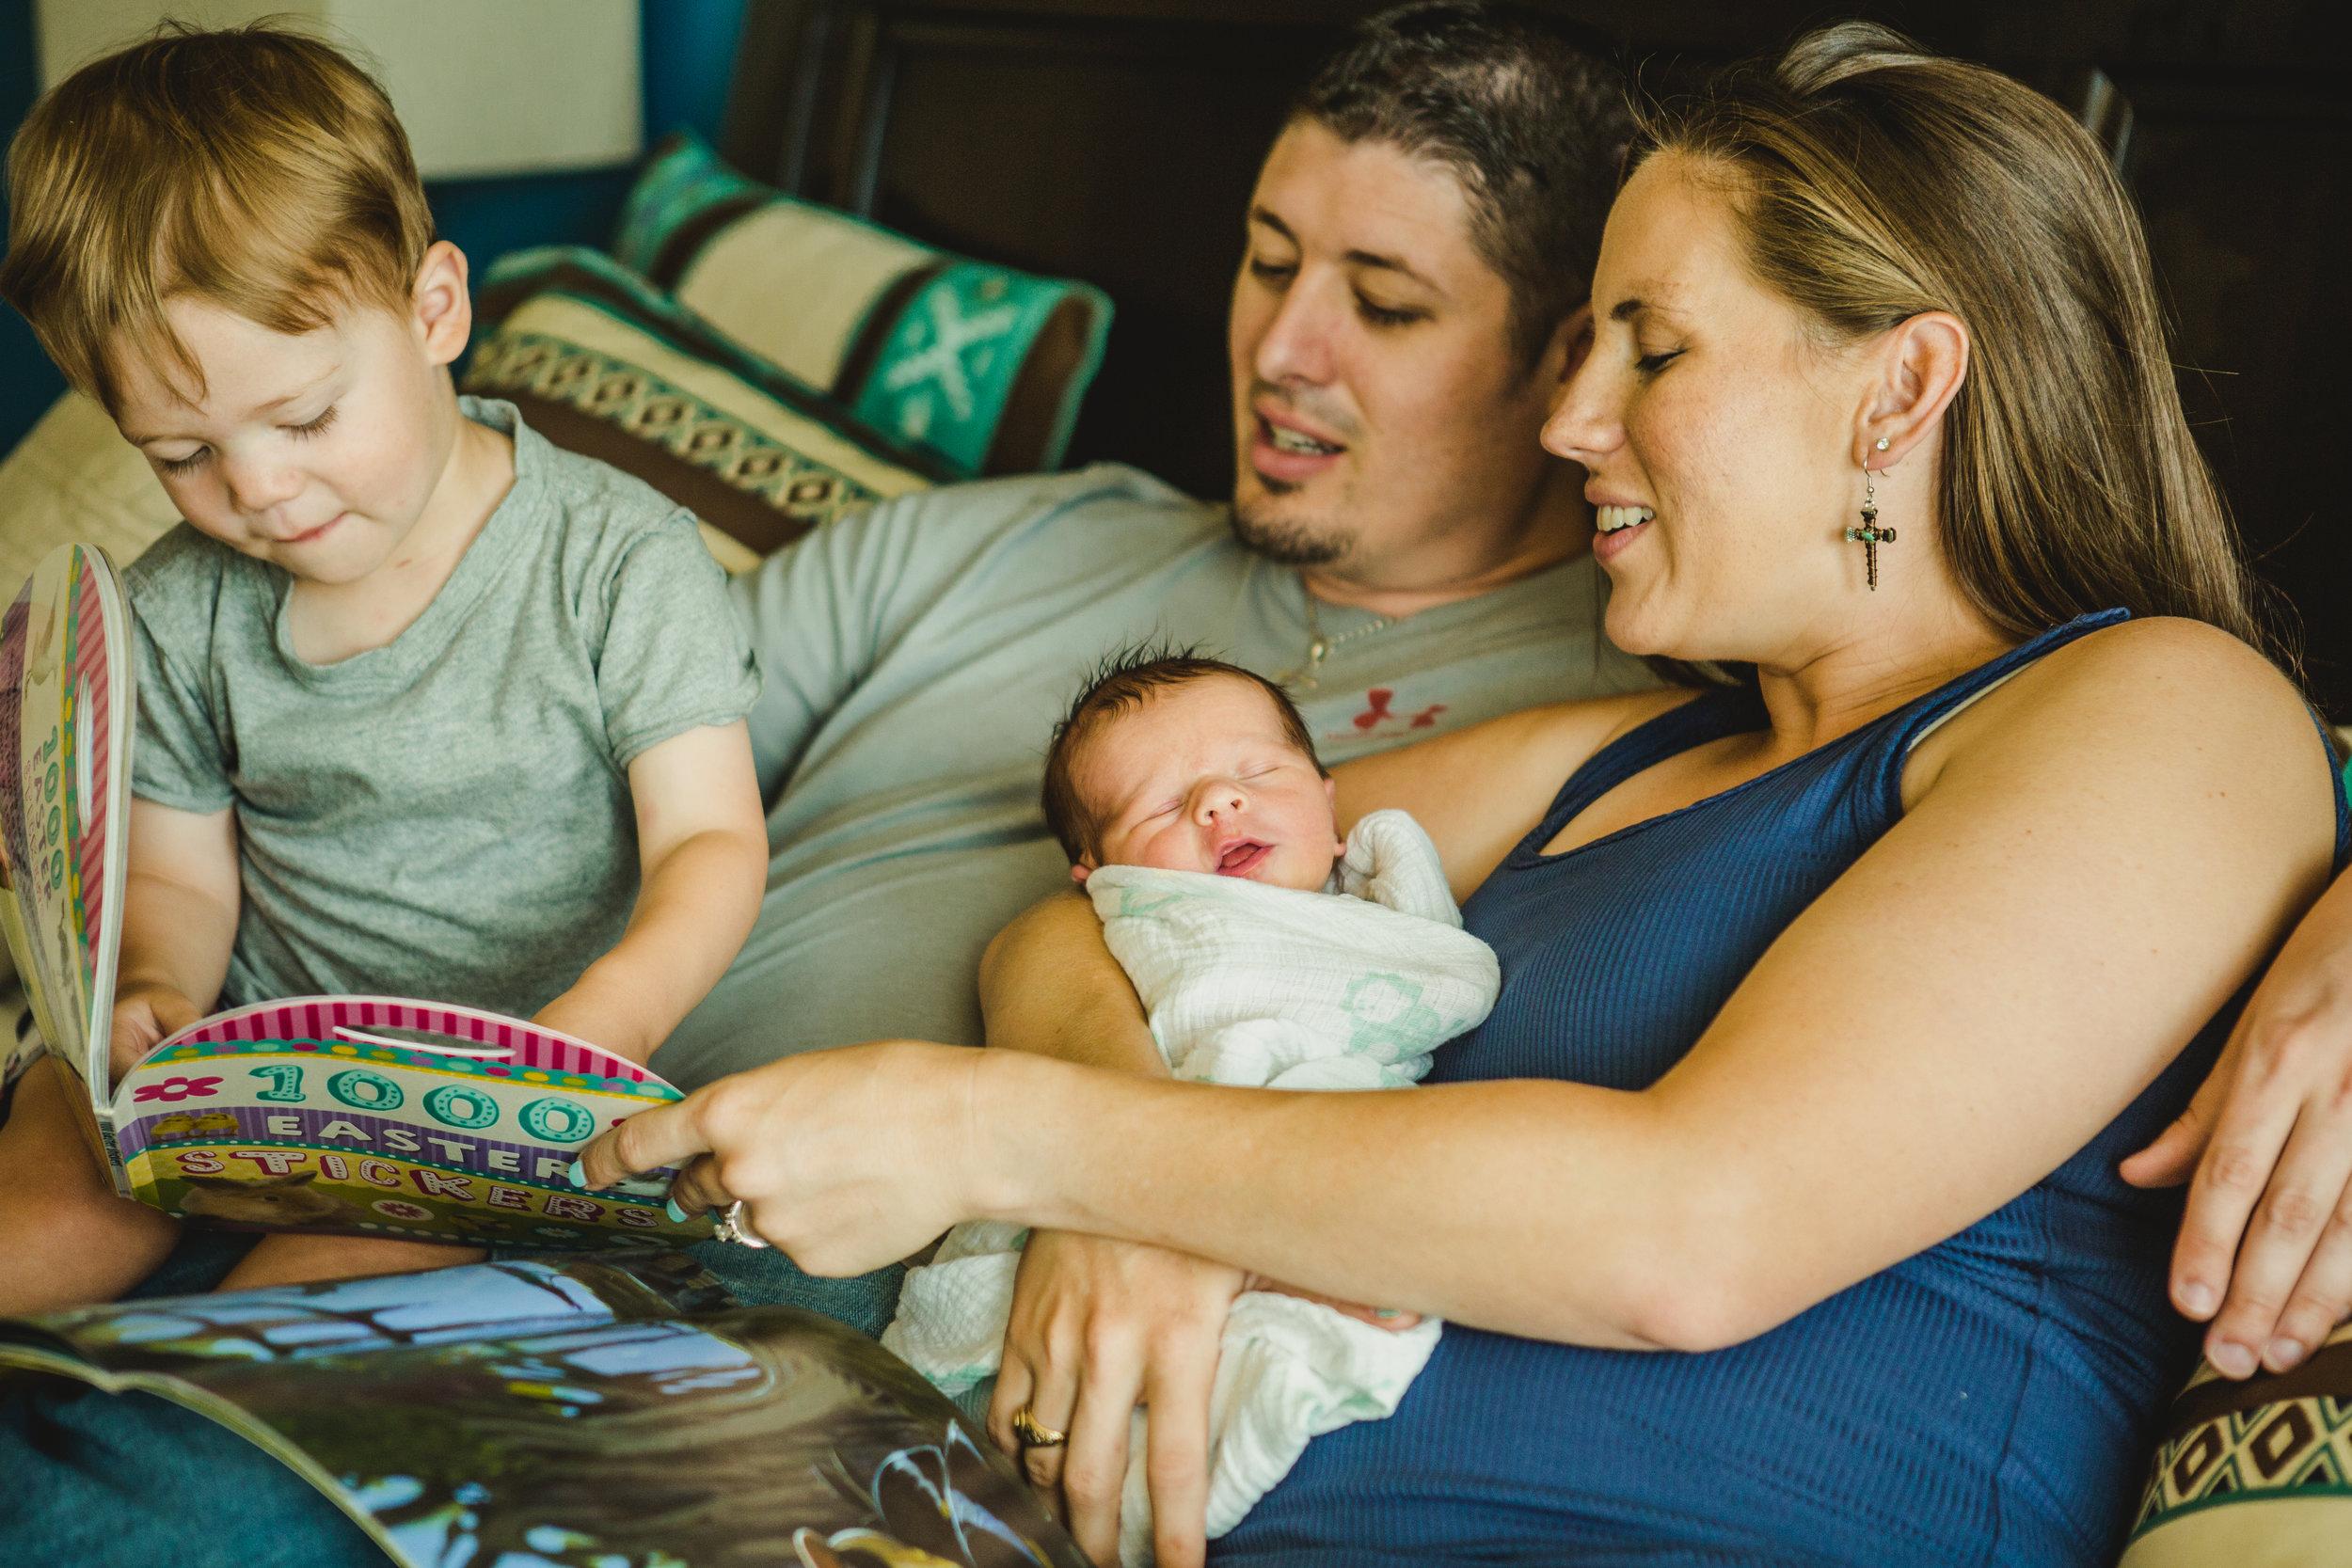 jax-in-home-newborn-session-8.jpg